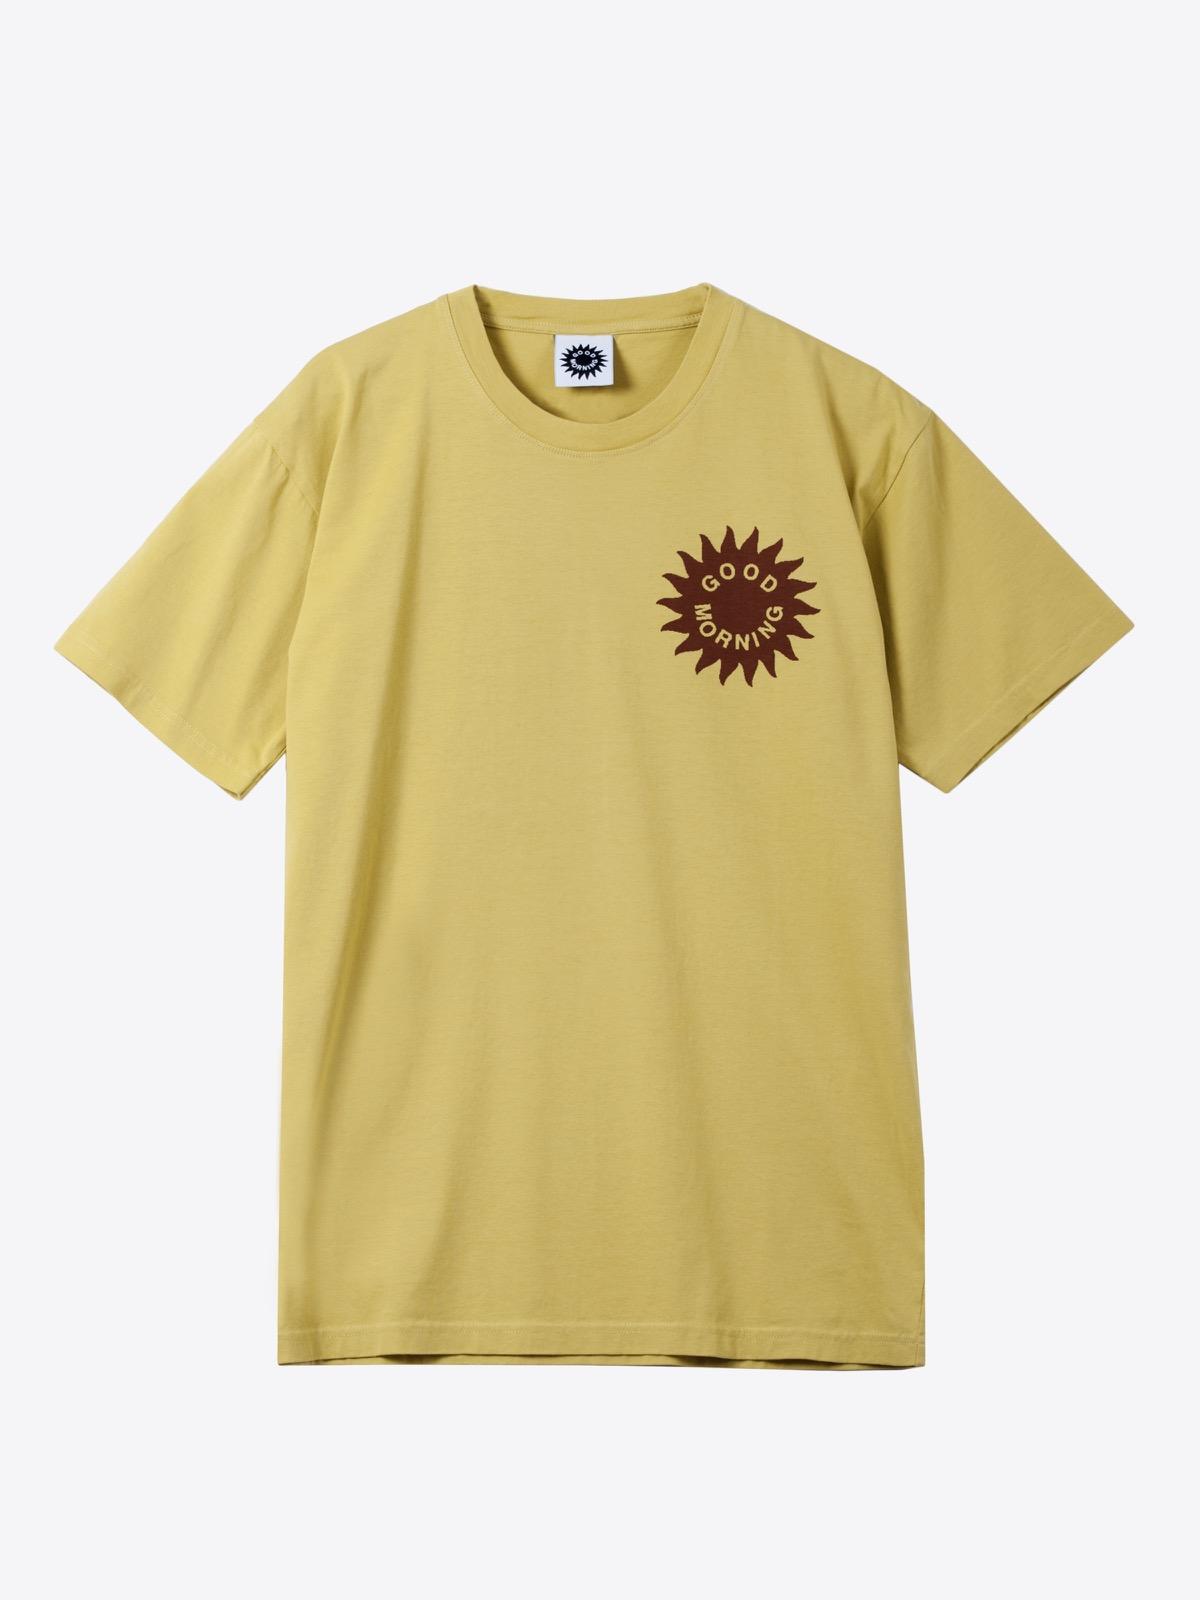 good morning tapes good morning tapes | logo sunflower